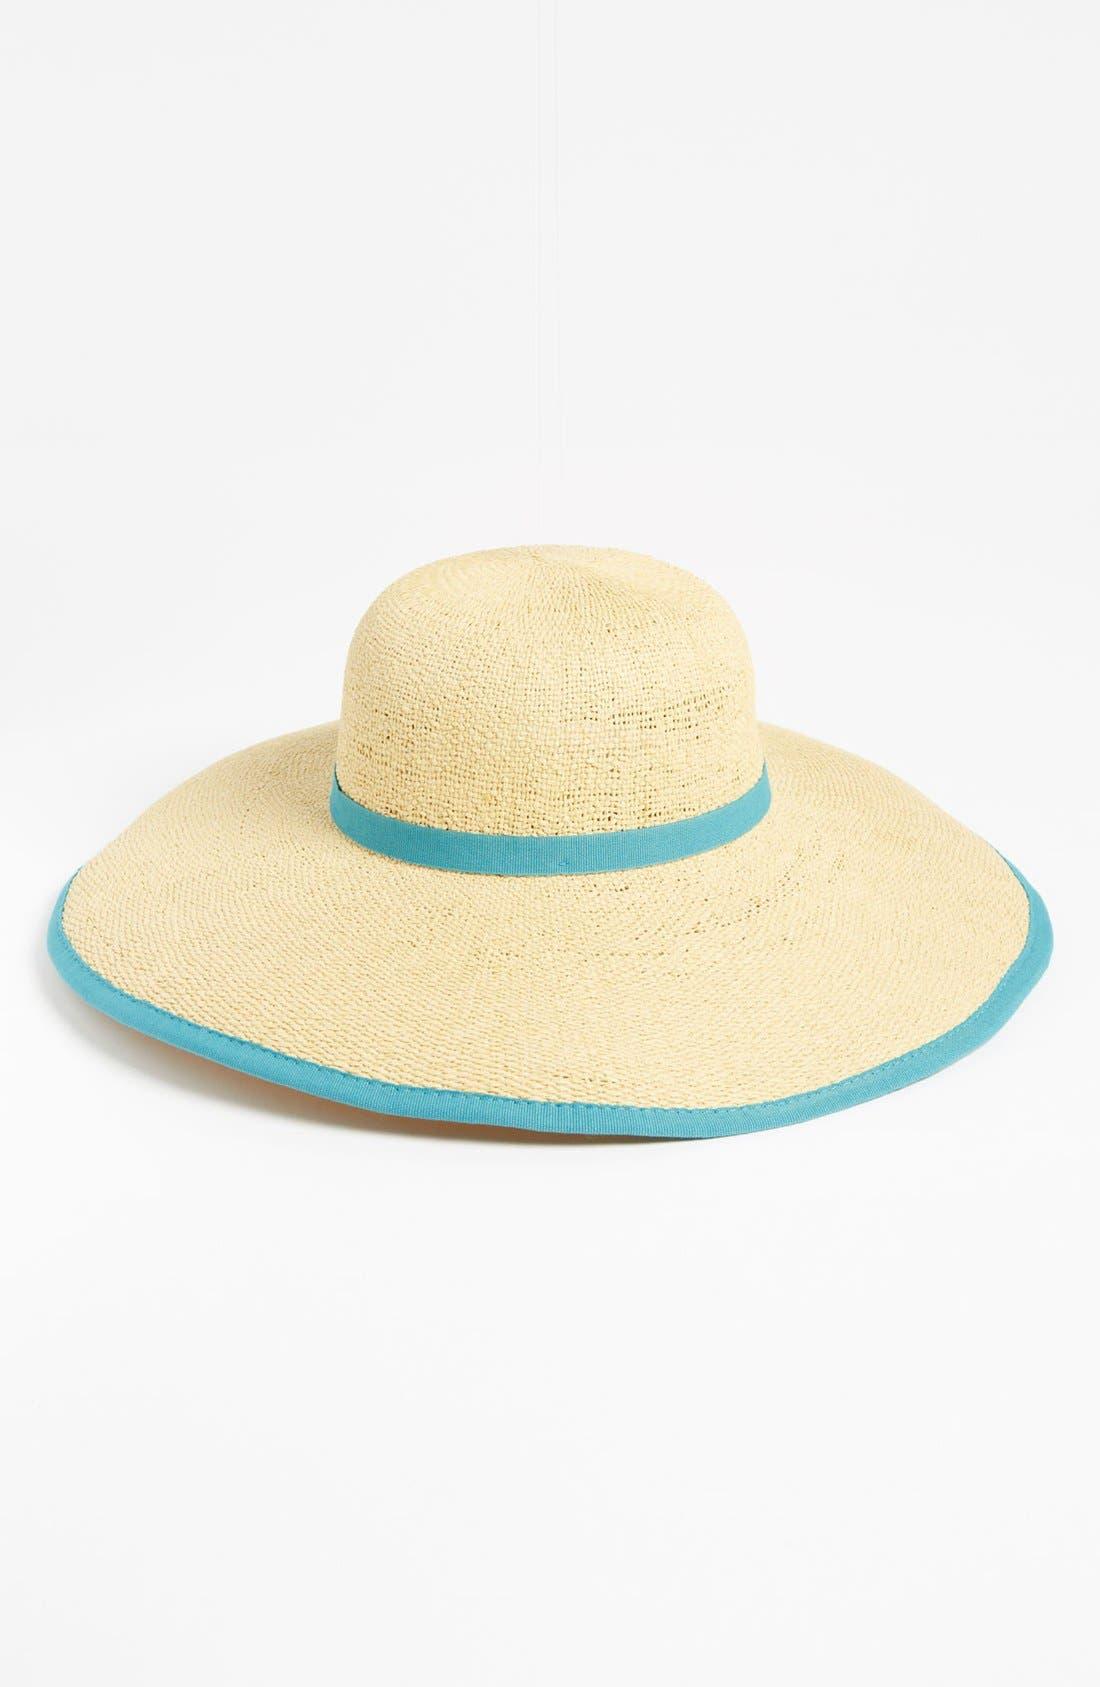 Main Image - Nordstrom Wire Brim Sun Hat